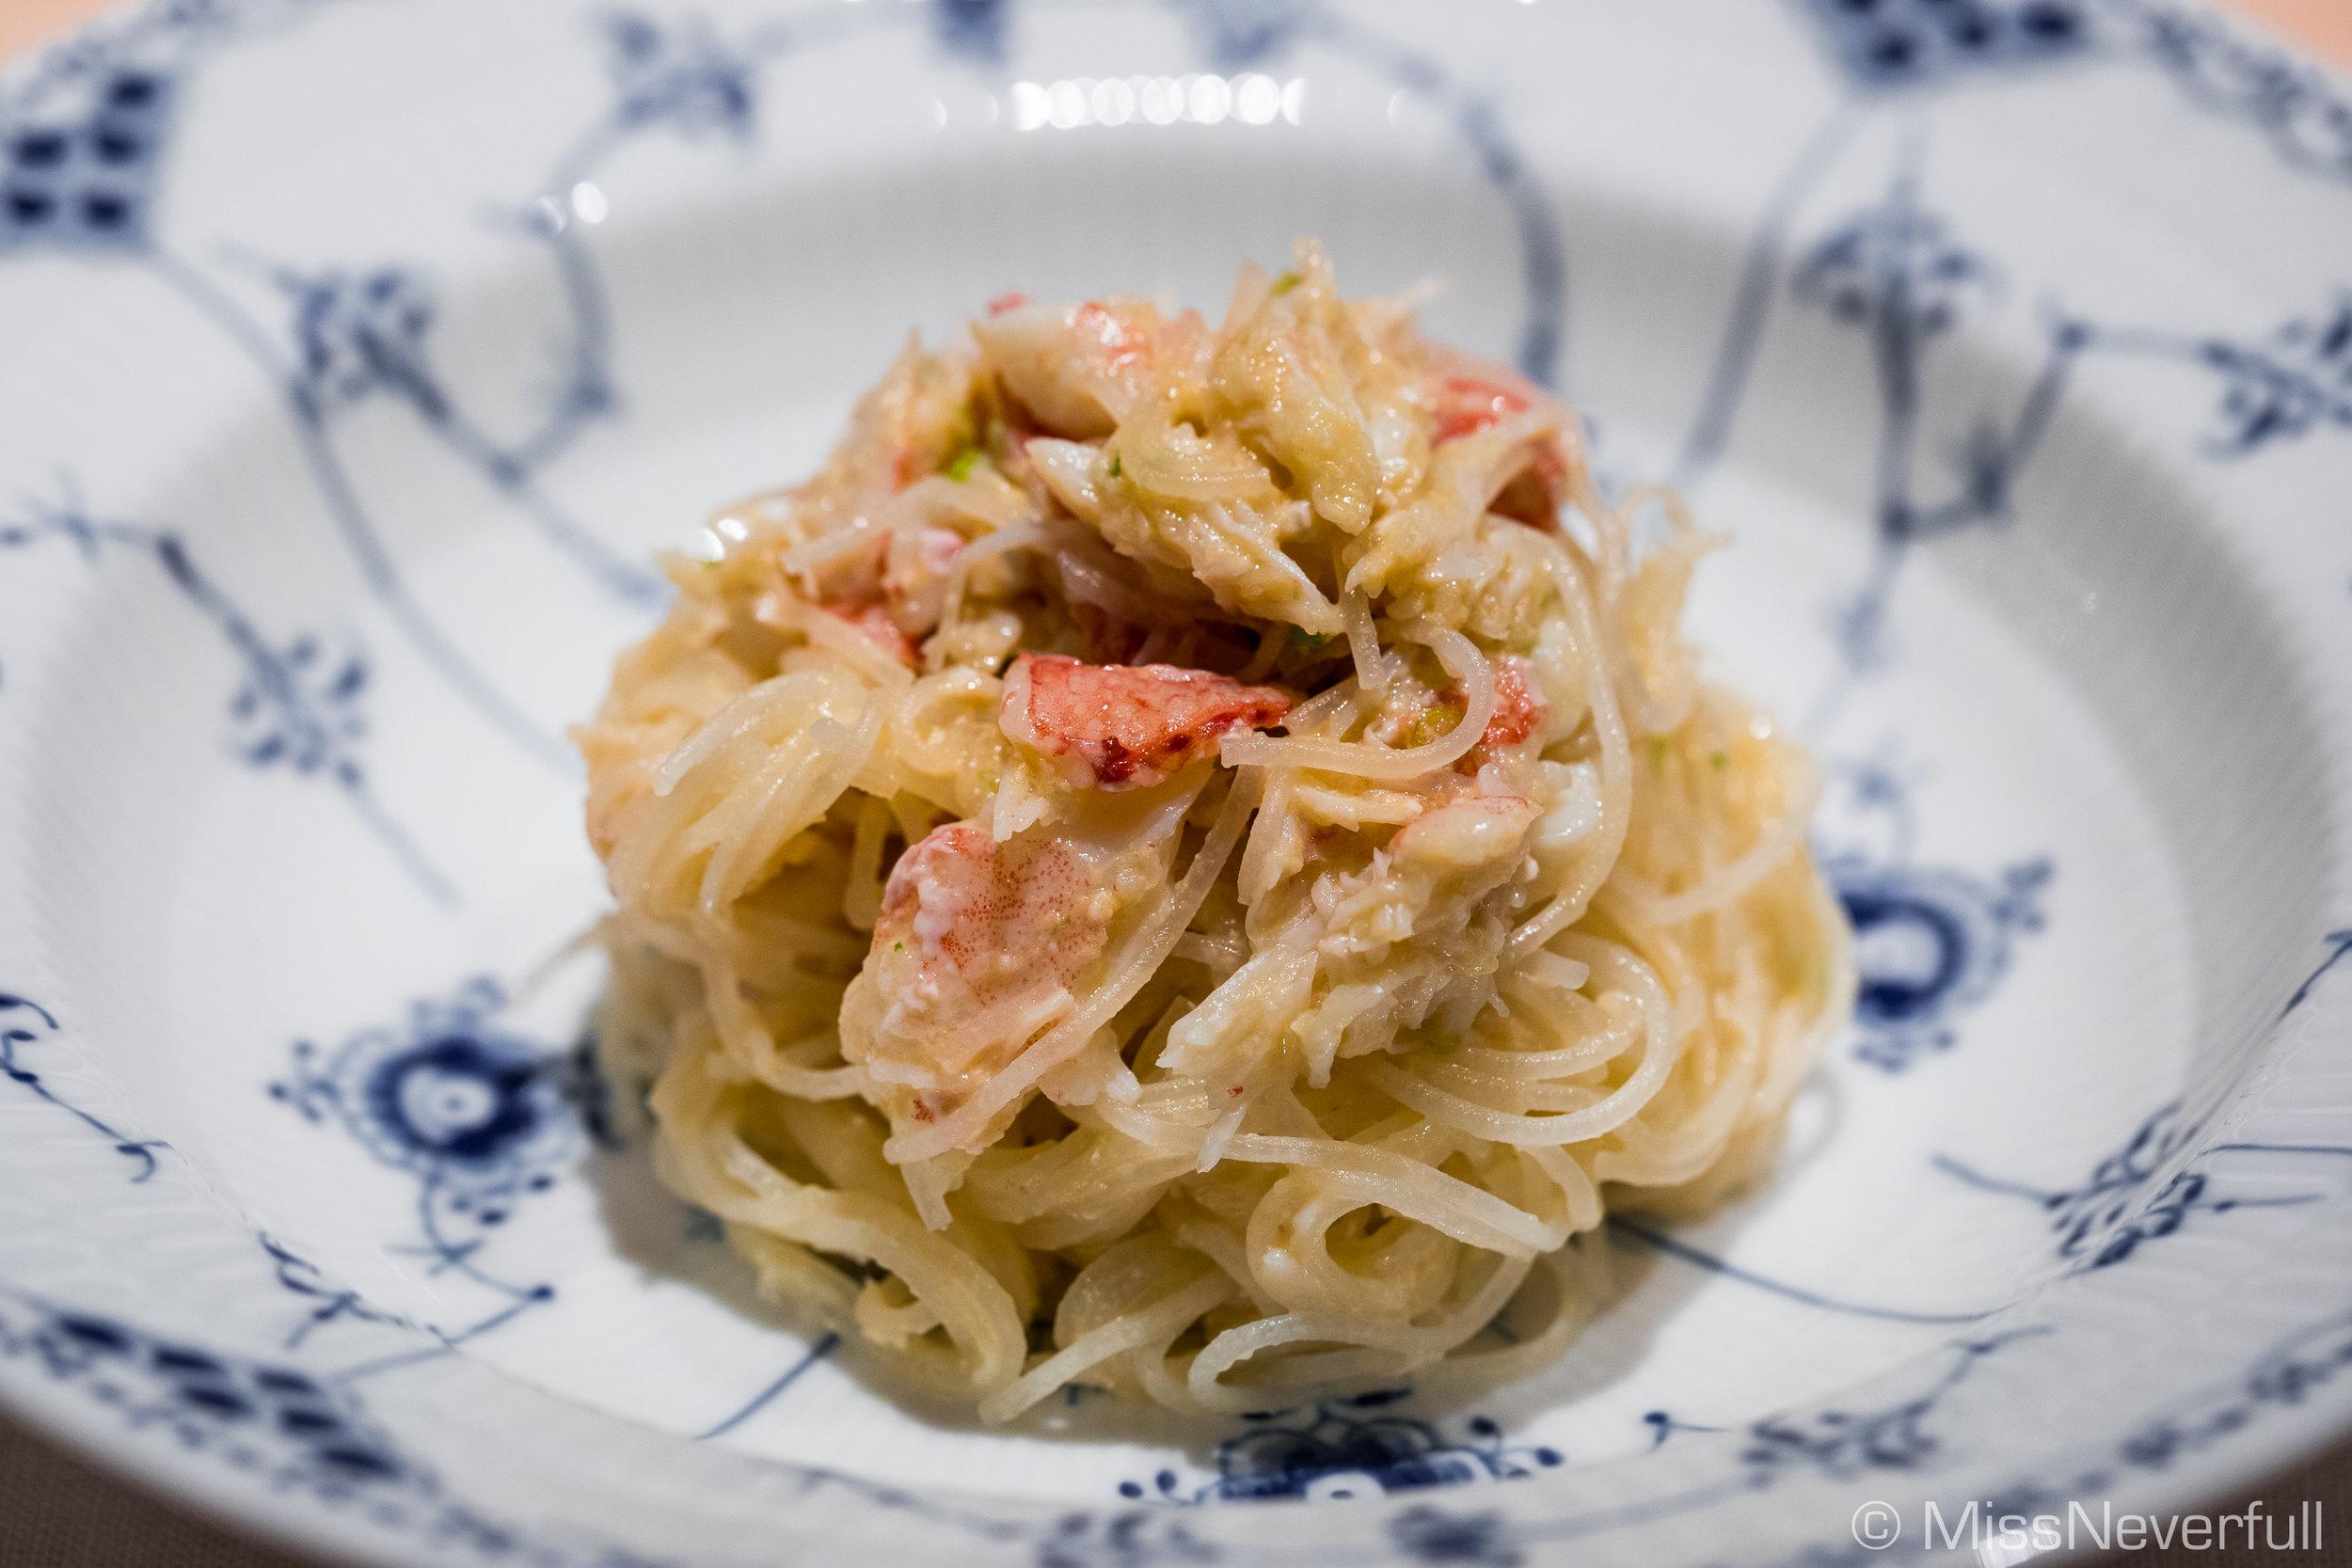 2.Kegani with vermicelli (噴火湾産の毛蟹とビーフン)